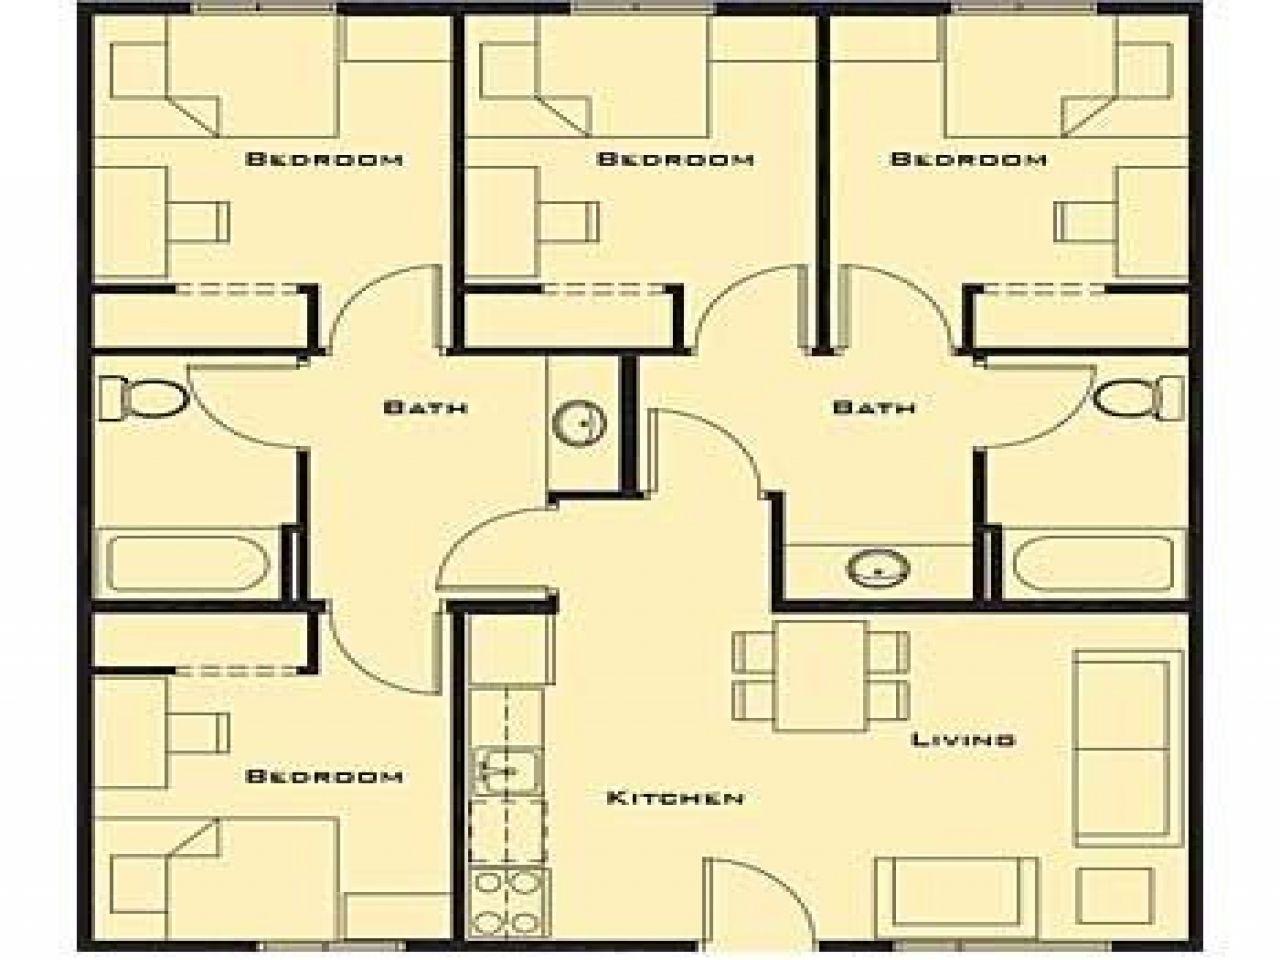 Simple 4 Bedroom House Designs Four Bedroom House Plans Bedroom House Plans Small House Plans